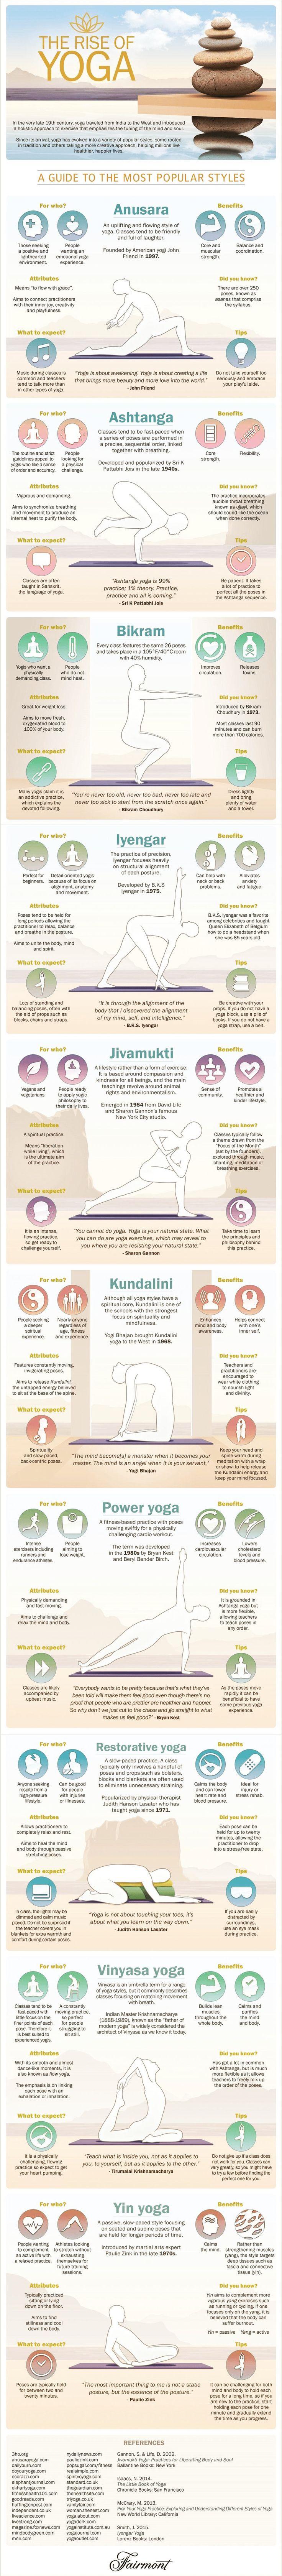 Most Popular Yoga Styles - Health Infographic. Topic: types of yoga, yogi, exercise, poses, postures, Anusara, Ashtanga, Bikram, Kripalu, Hatha, Iyengar, Kundalini, Jivamukti, Prenatal, Restorative, Sivananda, Viniyoga, Yin, Power yoga.